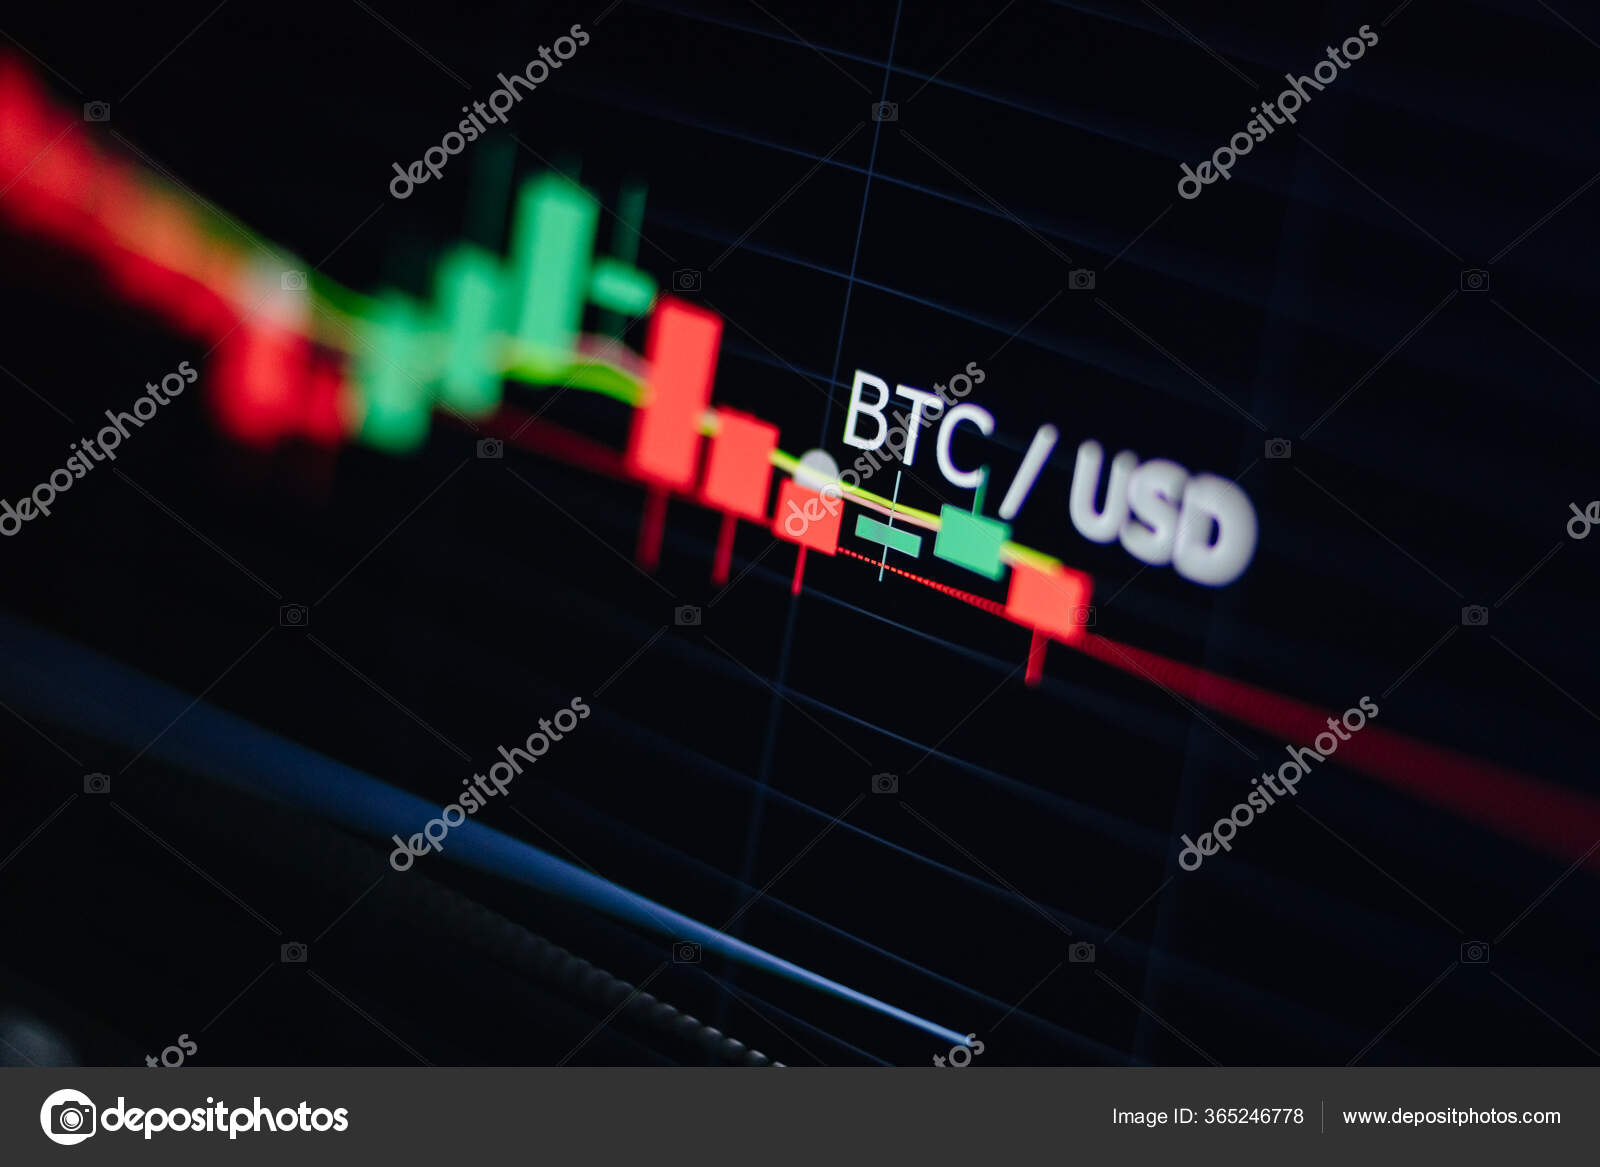 btc usd trading)